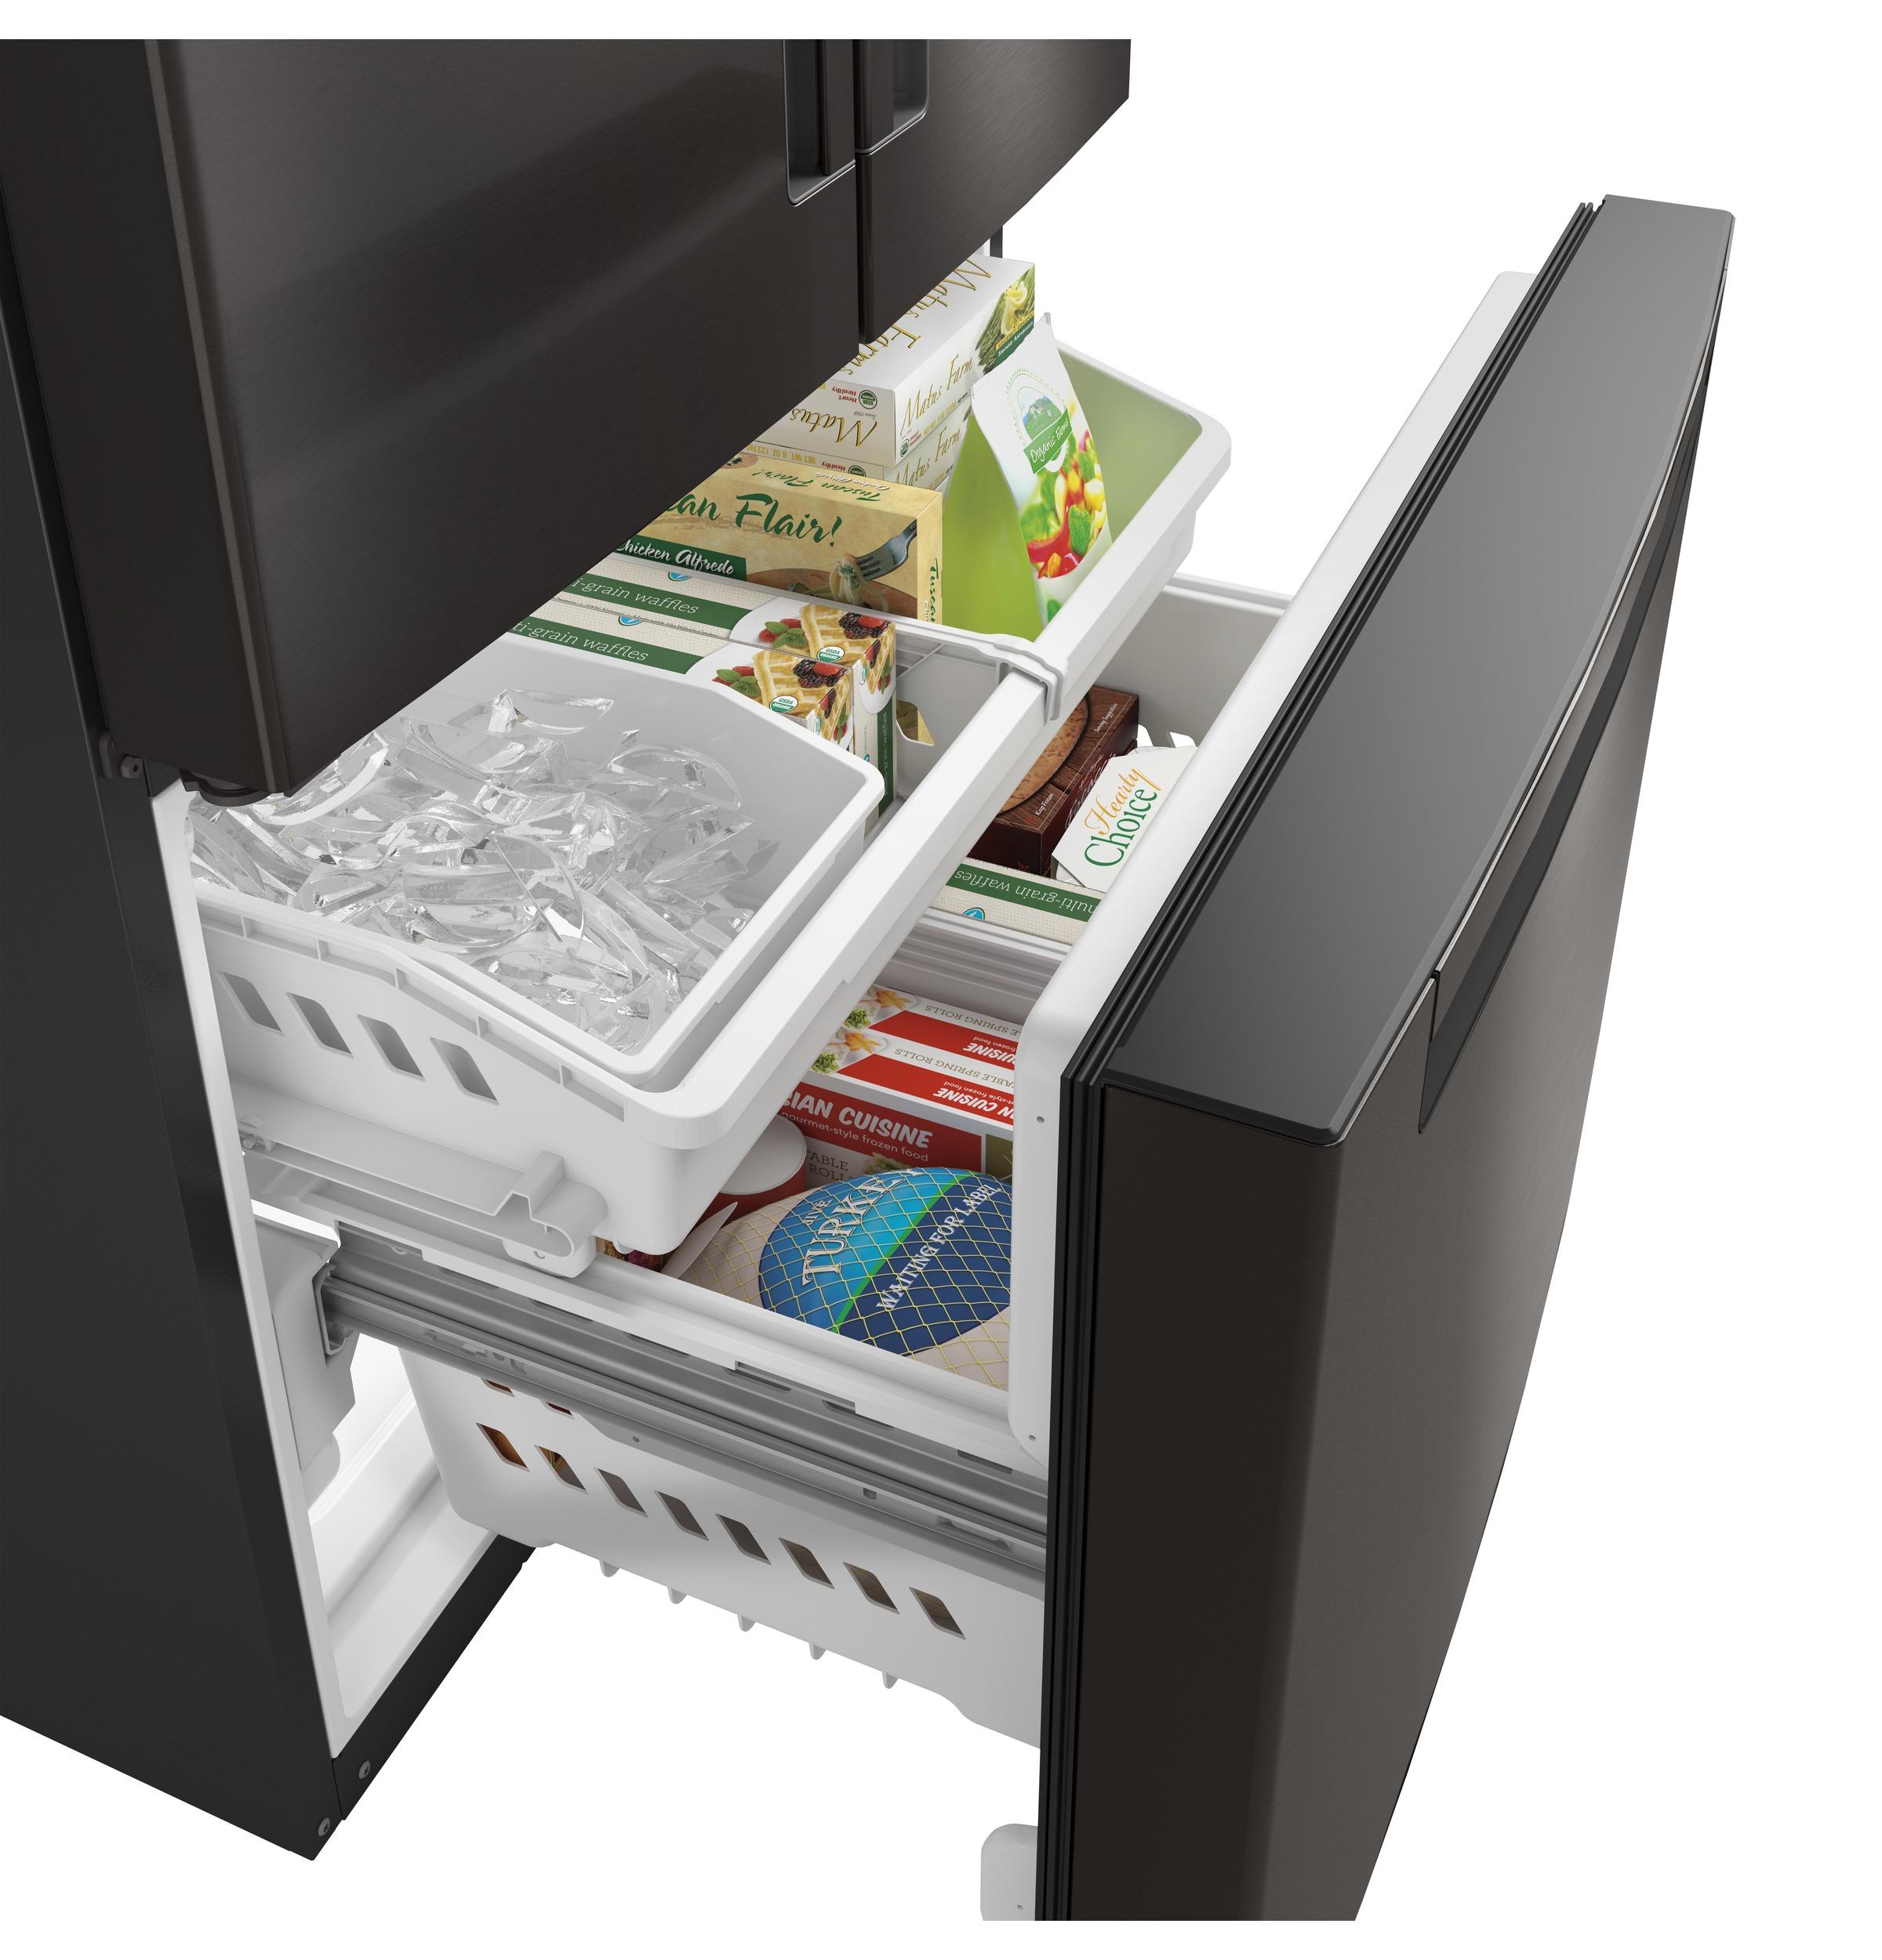 Model: QNE27JBMTS | ENERGY STAR® 27.0 Cu. Ft. French-Door Refrigerator